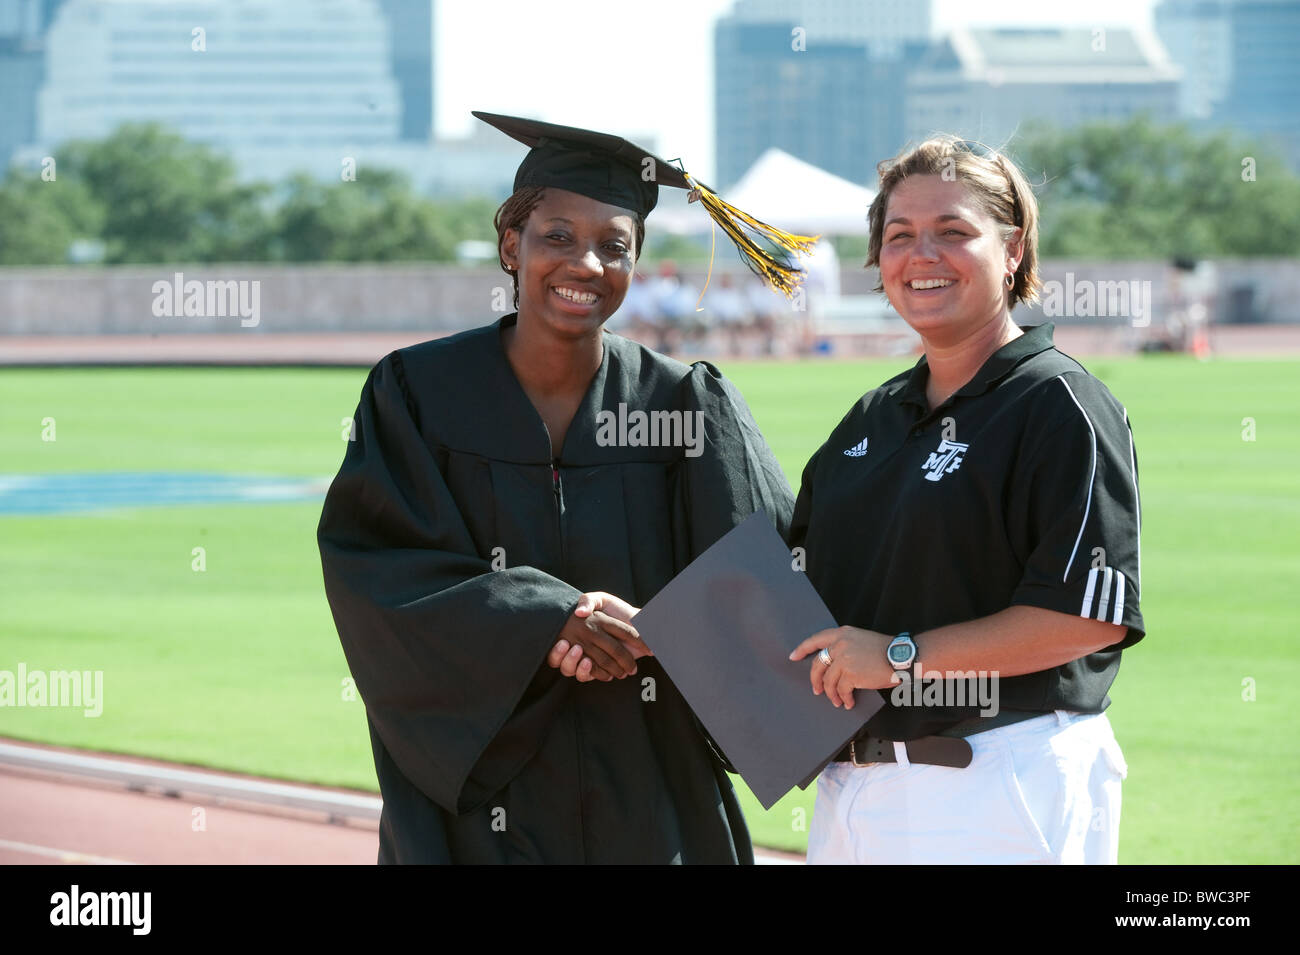 High School Diploma Stockfotos & High School Diploma Bilder - Alamy